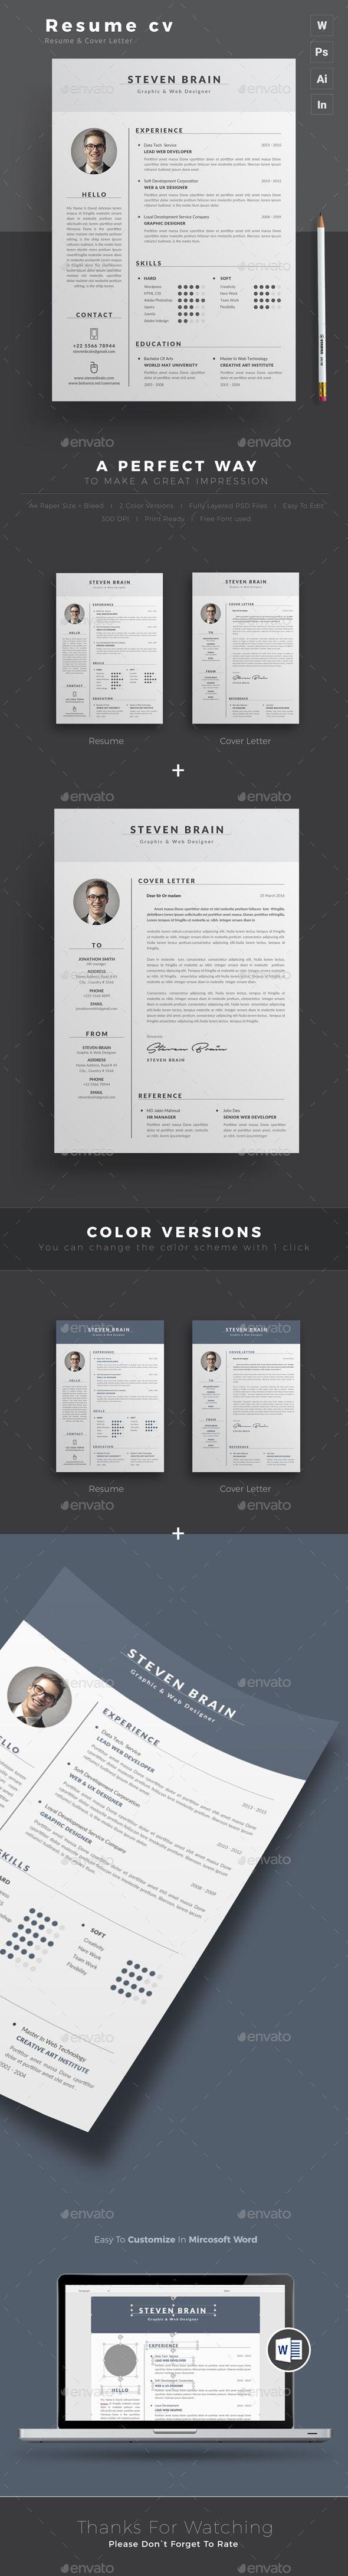 Resume — Photoshop PSD #creative resume #portfolio • Available here → https://graphicriver.net/item/resume/15438388?ref=pxcr